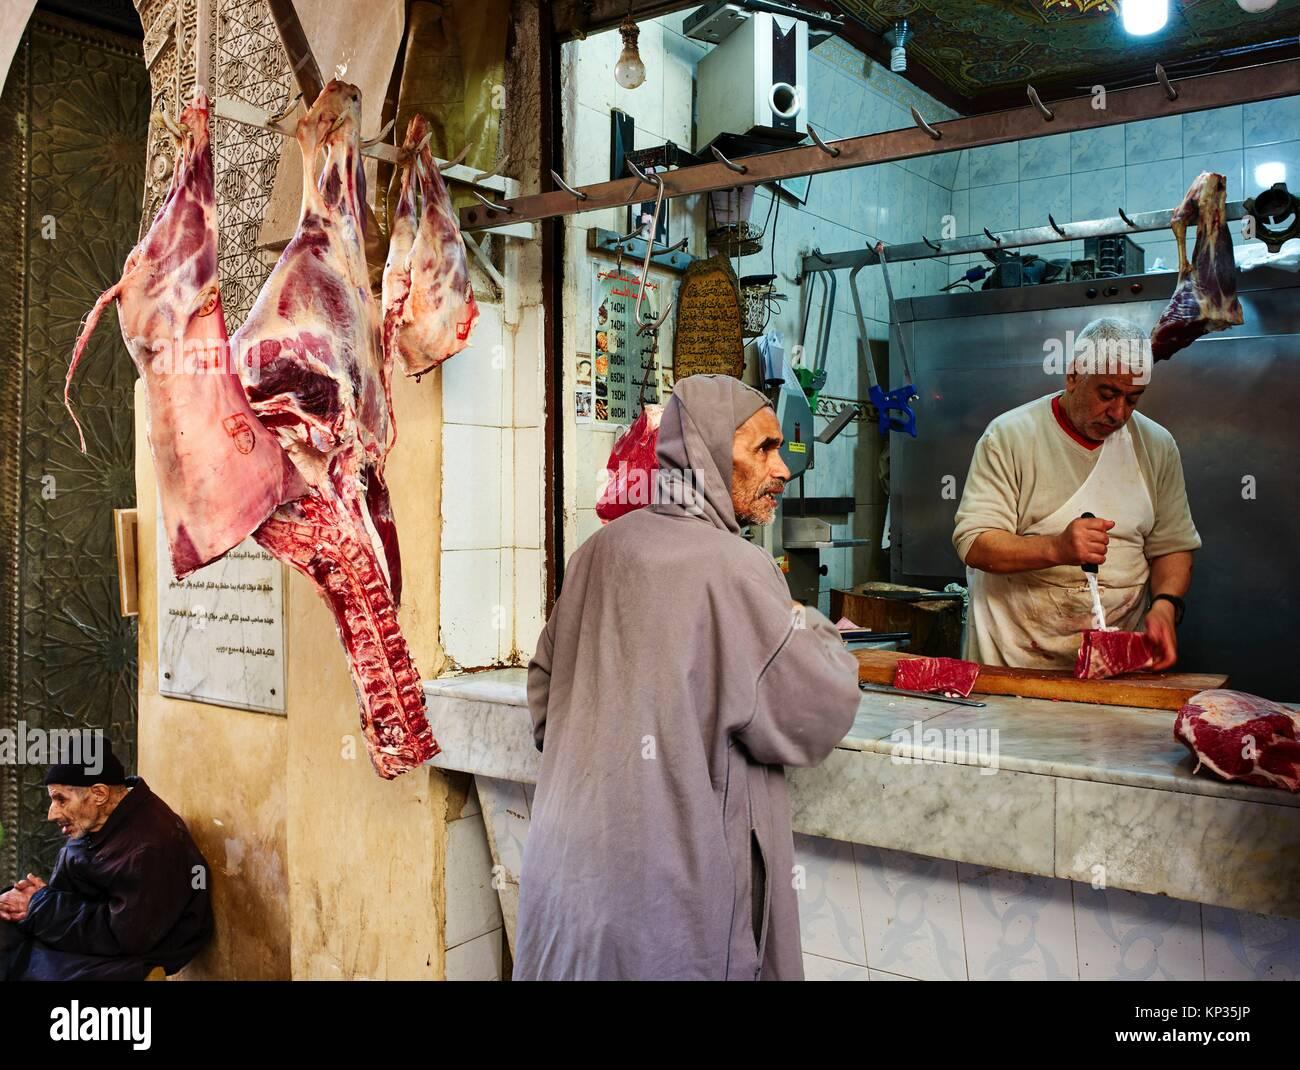 Butcher´s shop in the medina of Fez, Morocco - Stock Image